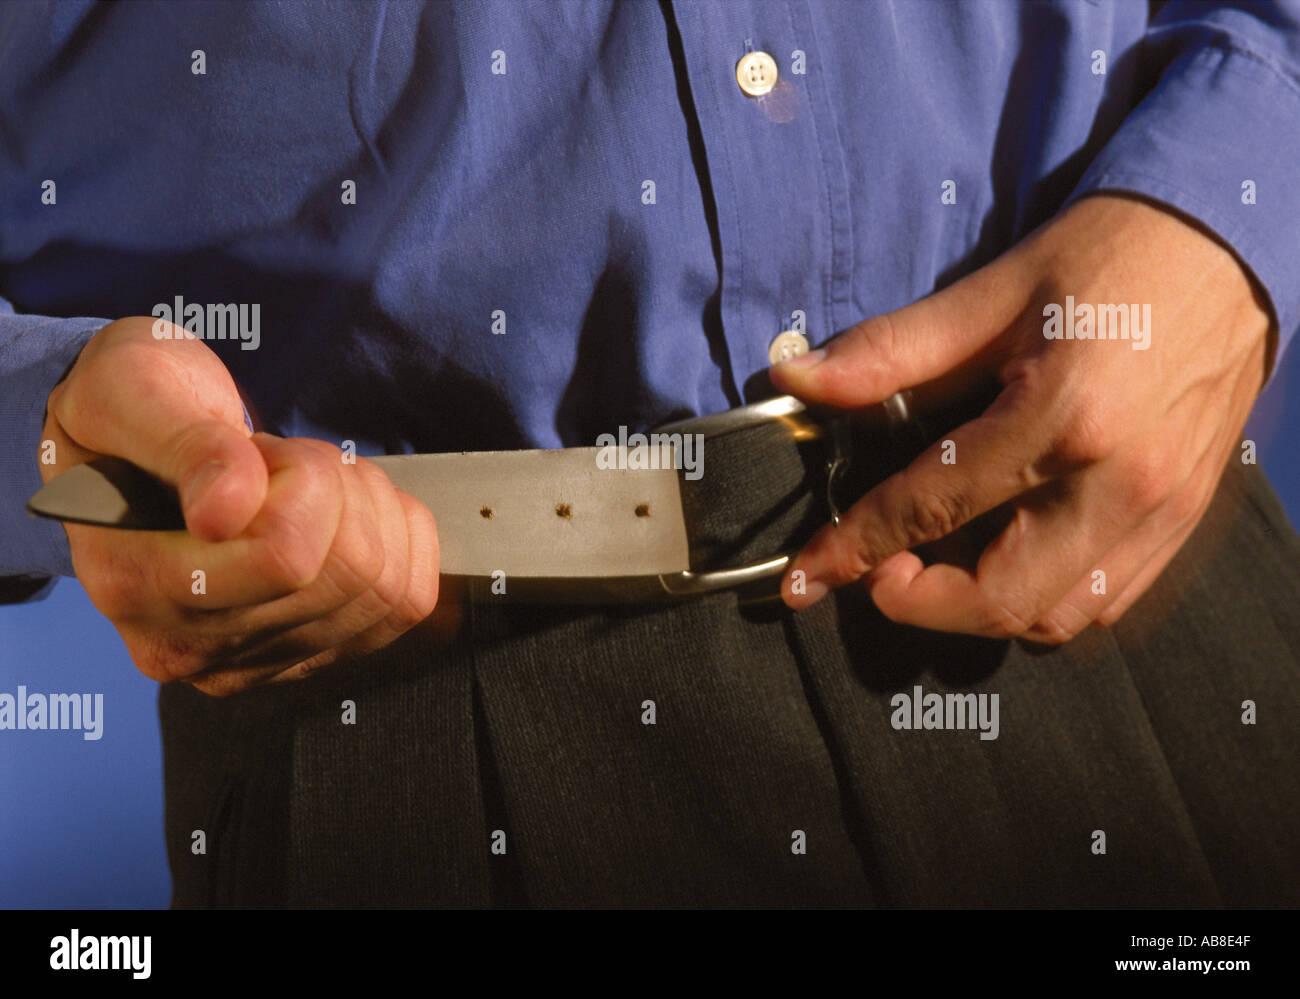 Tightening the belt - Stock Image